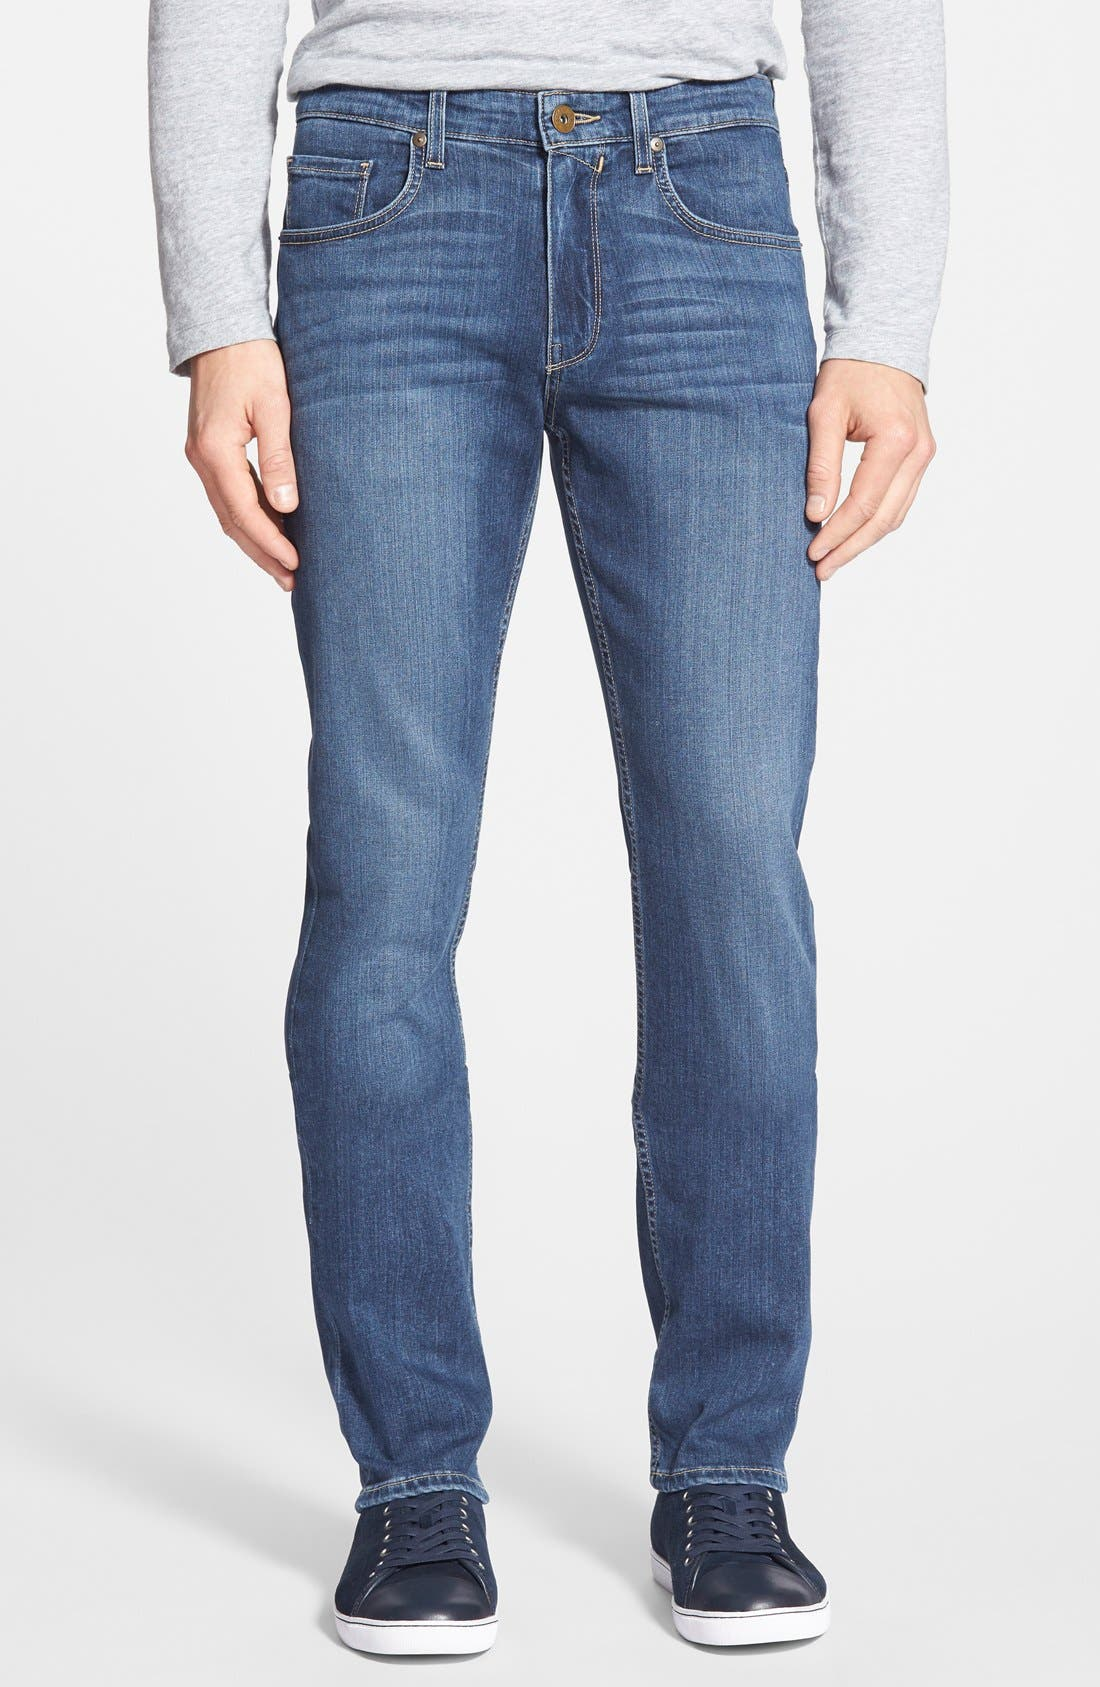 Transcend - Federal Slim Straight Leg Jeans,                         Main,                         color, Birch